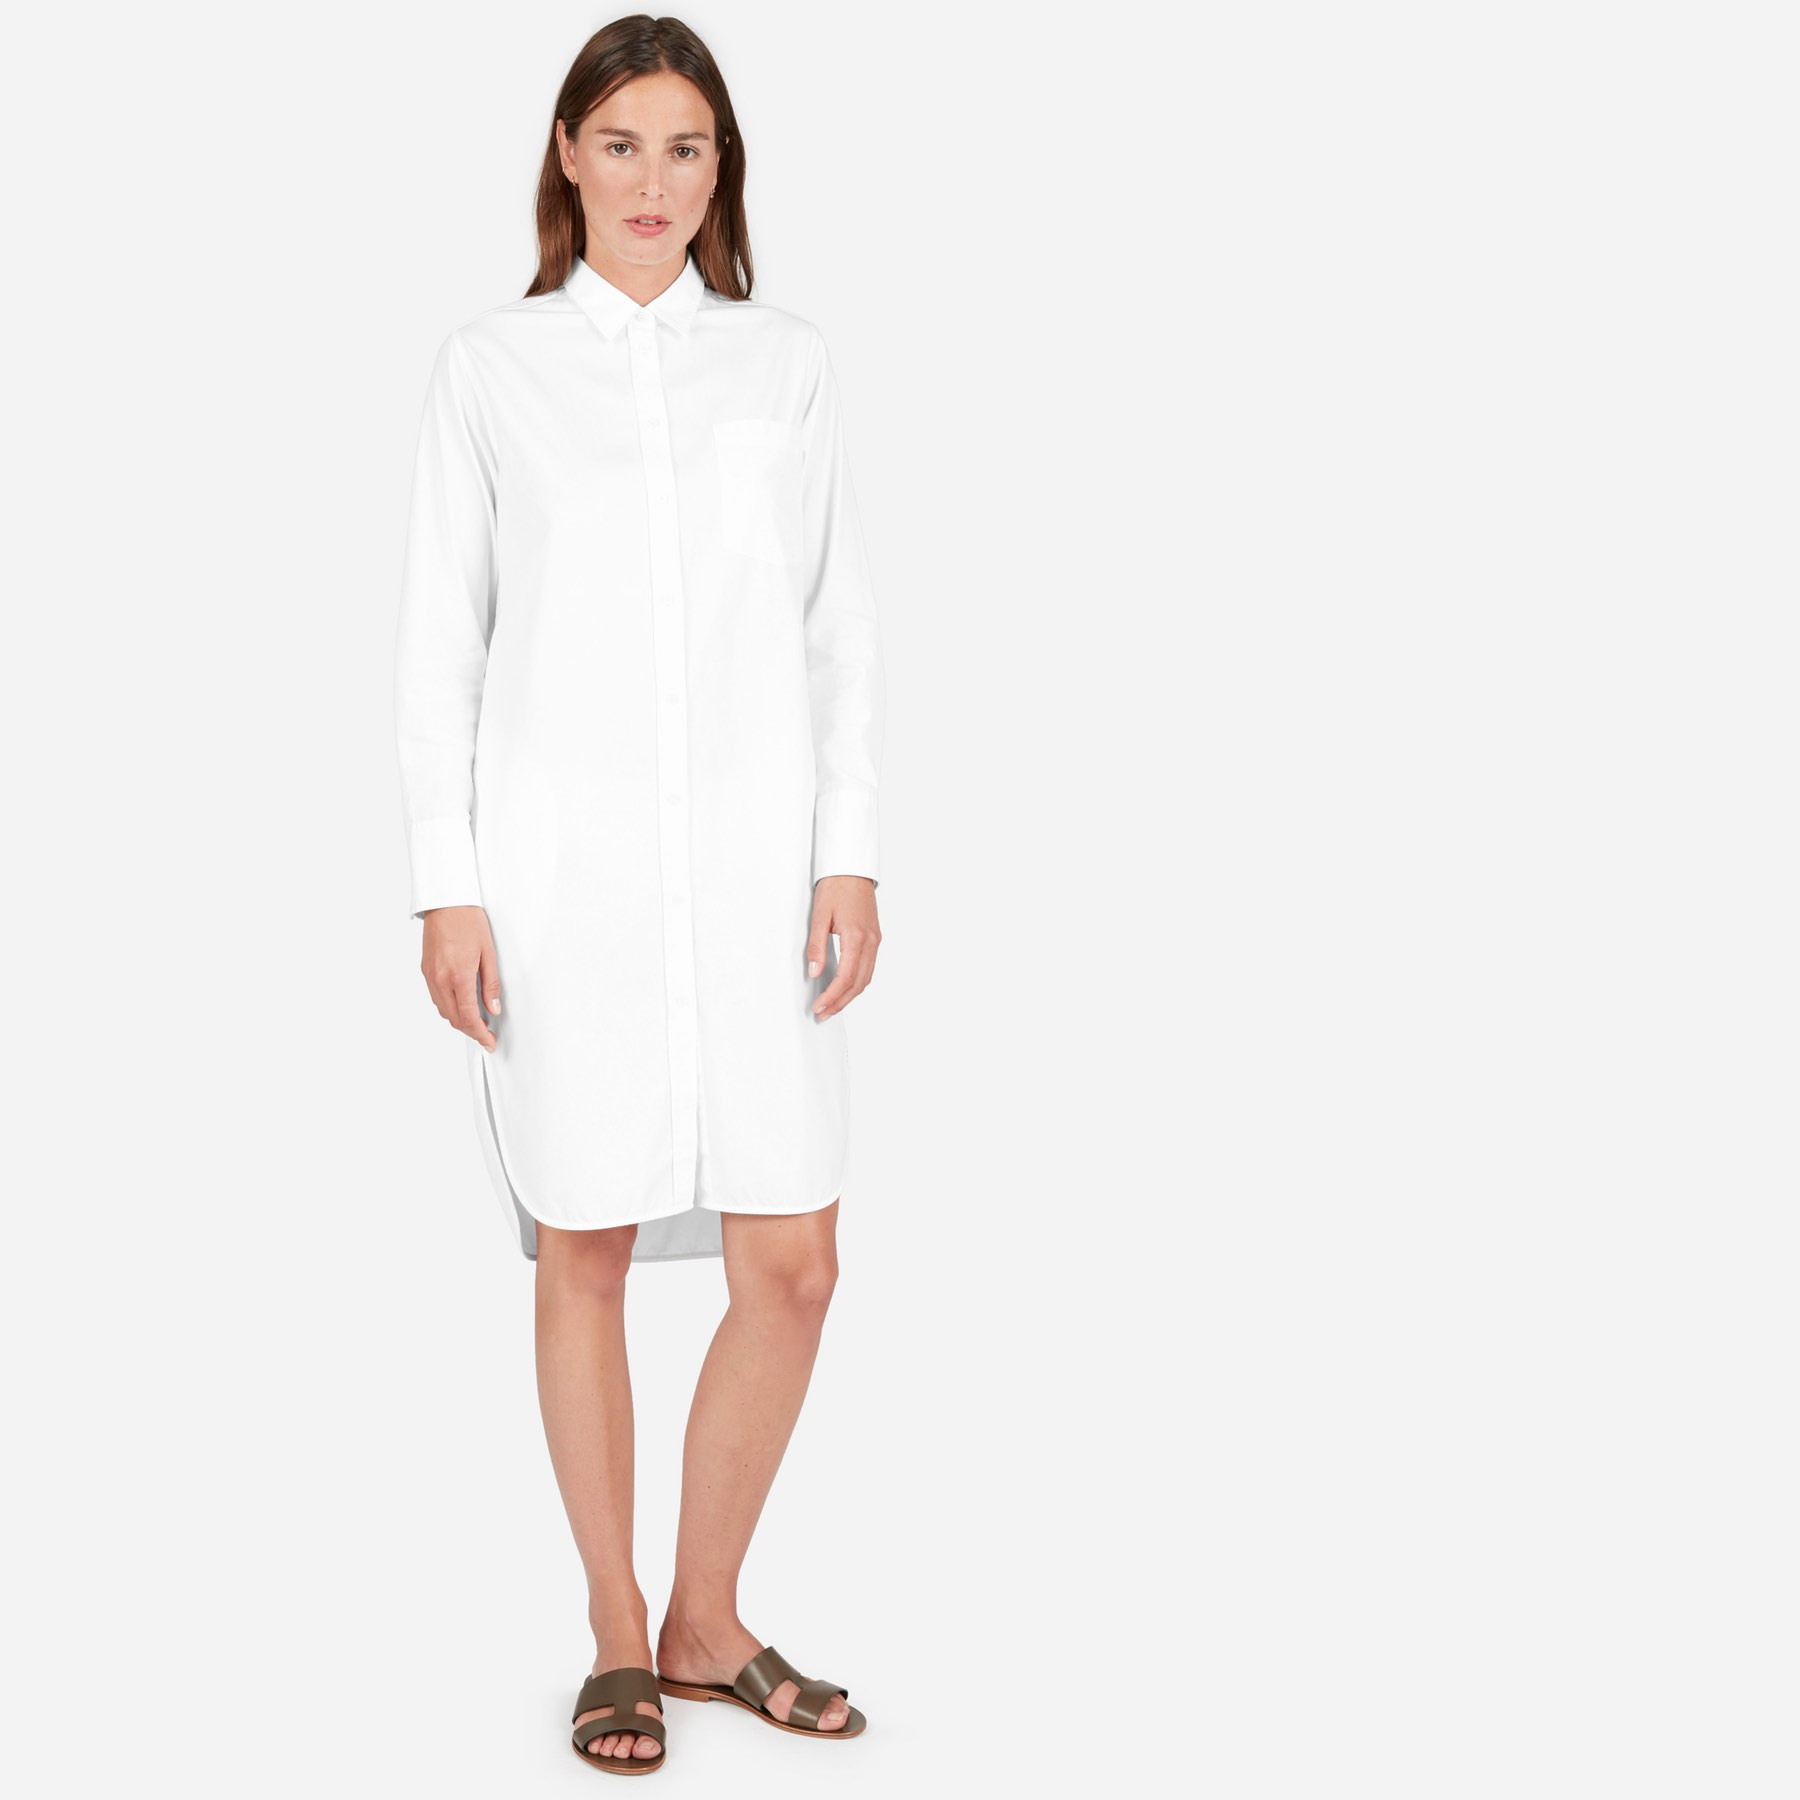 The Plain Shirtdress